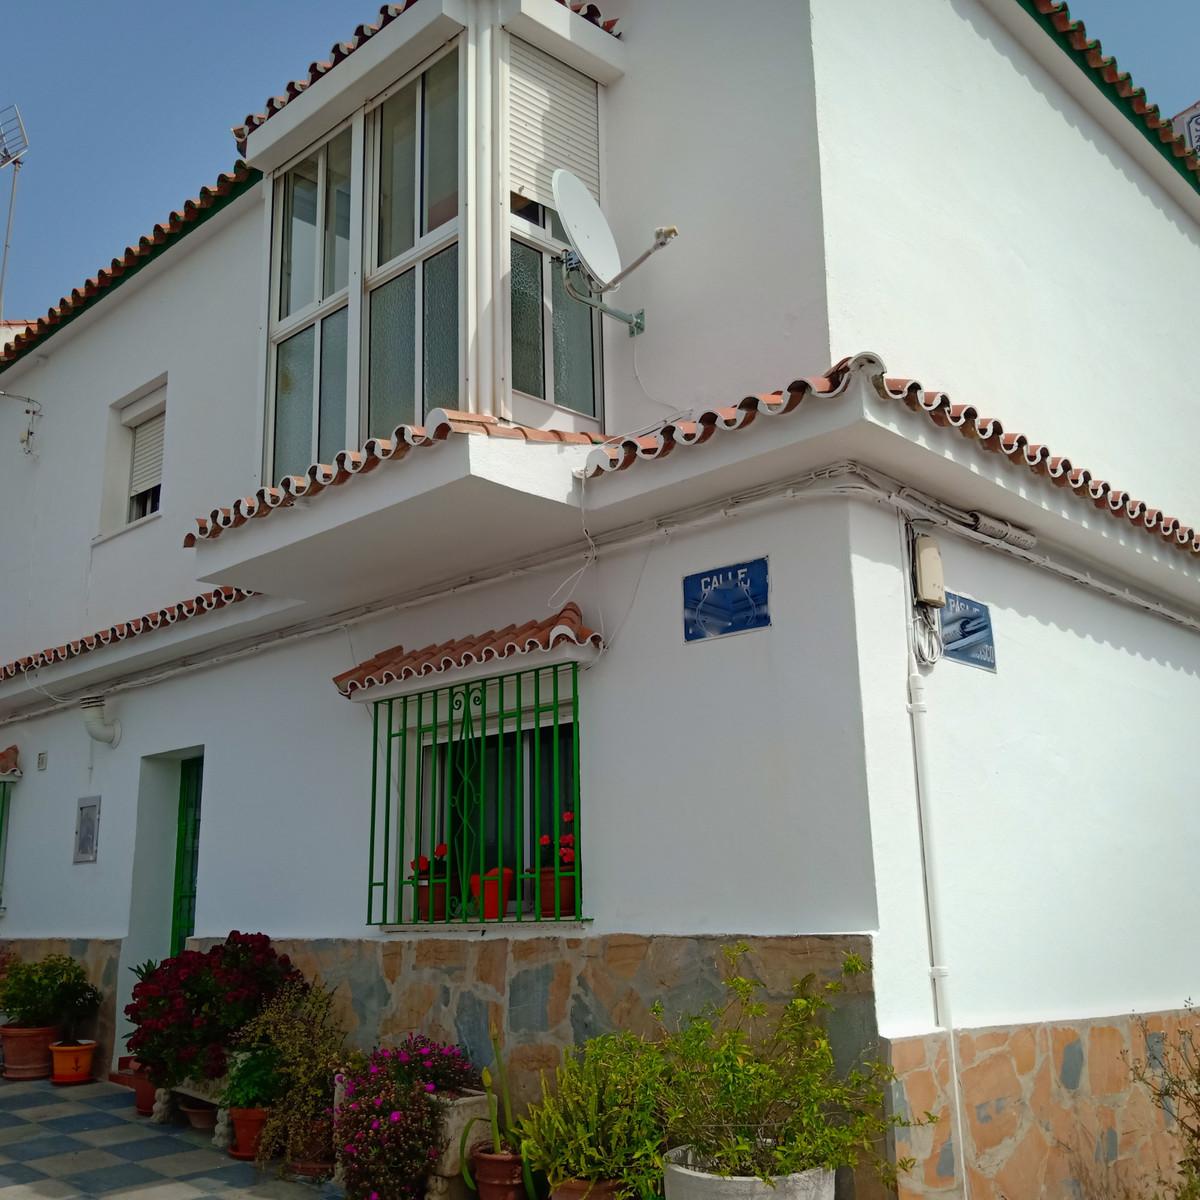 Semi-Detached House for sale in Pueblo Nuevo de Guadiaro R3830869